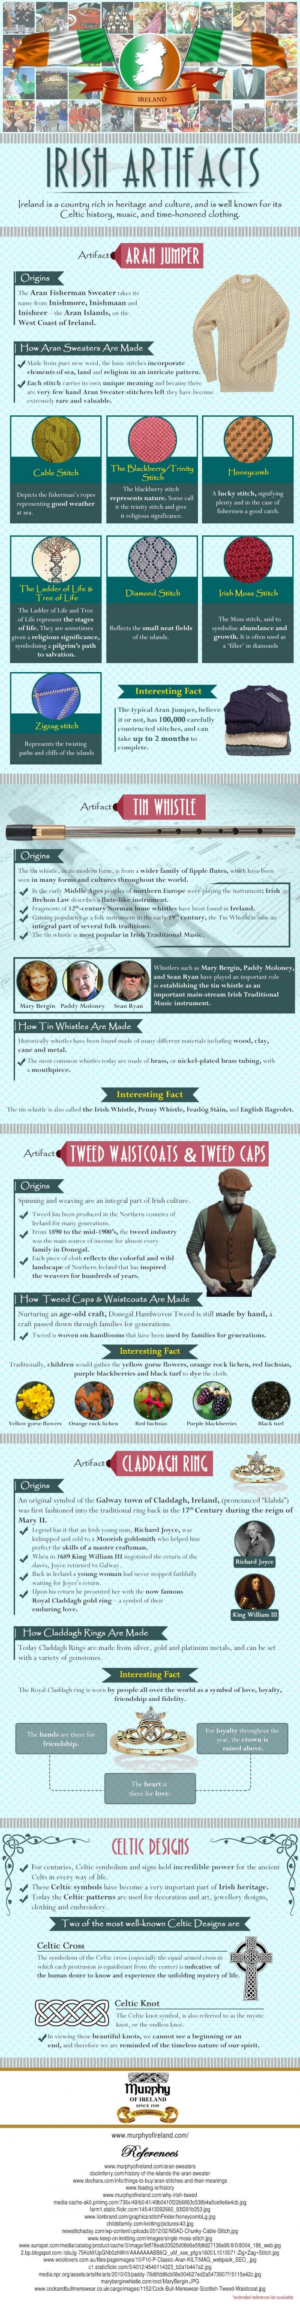 Murphy-of-Ireland-Infographic